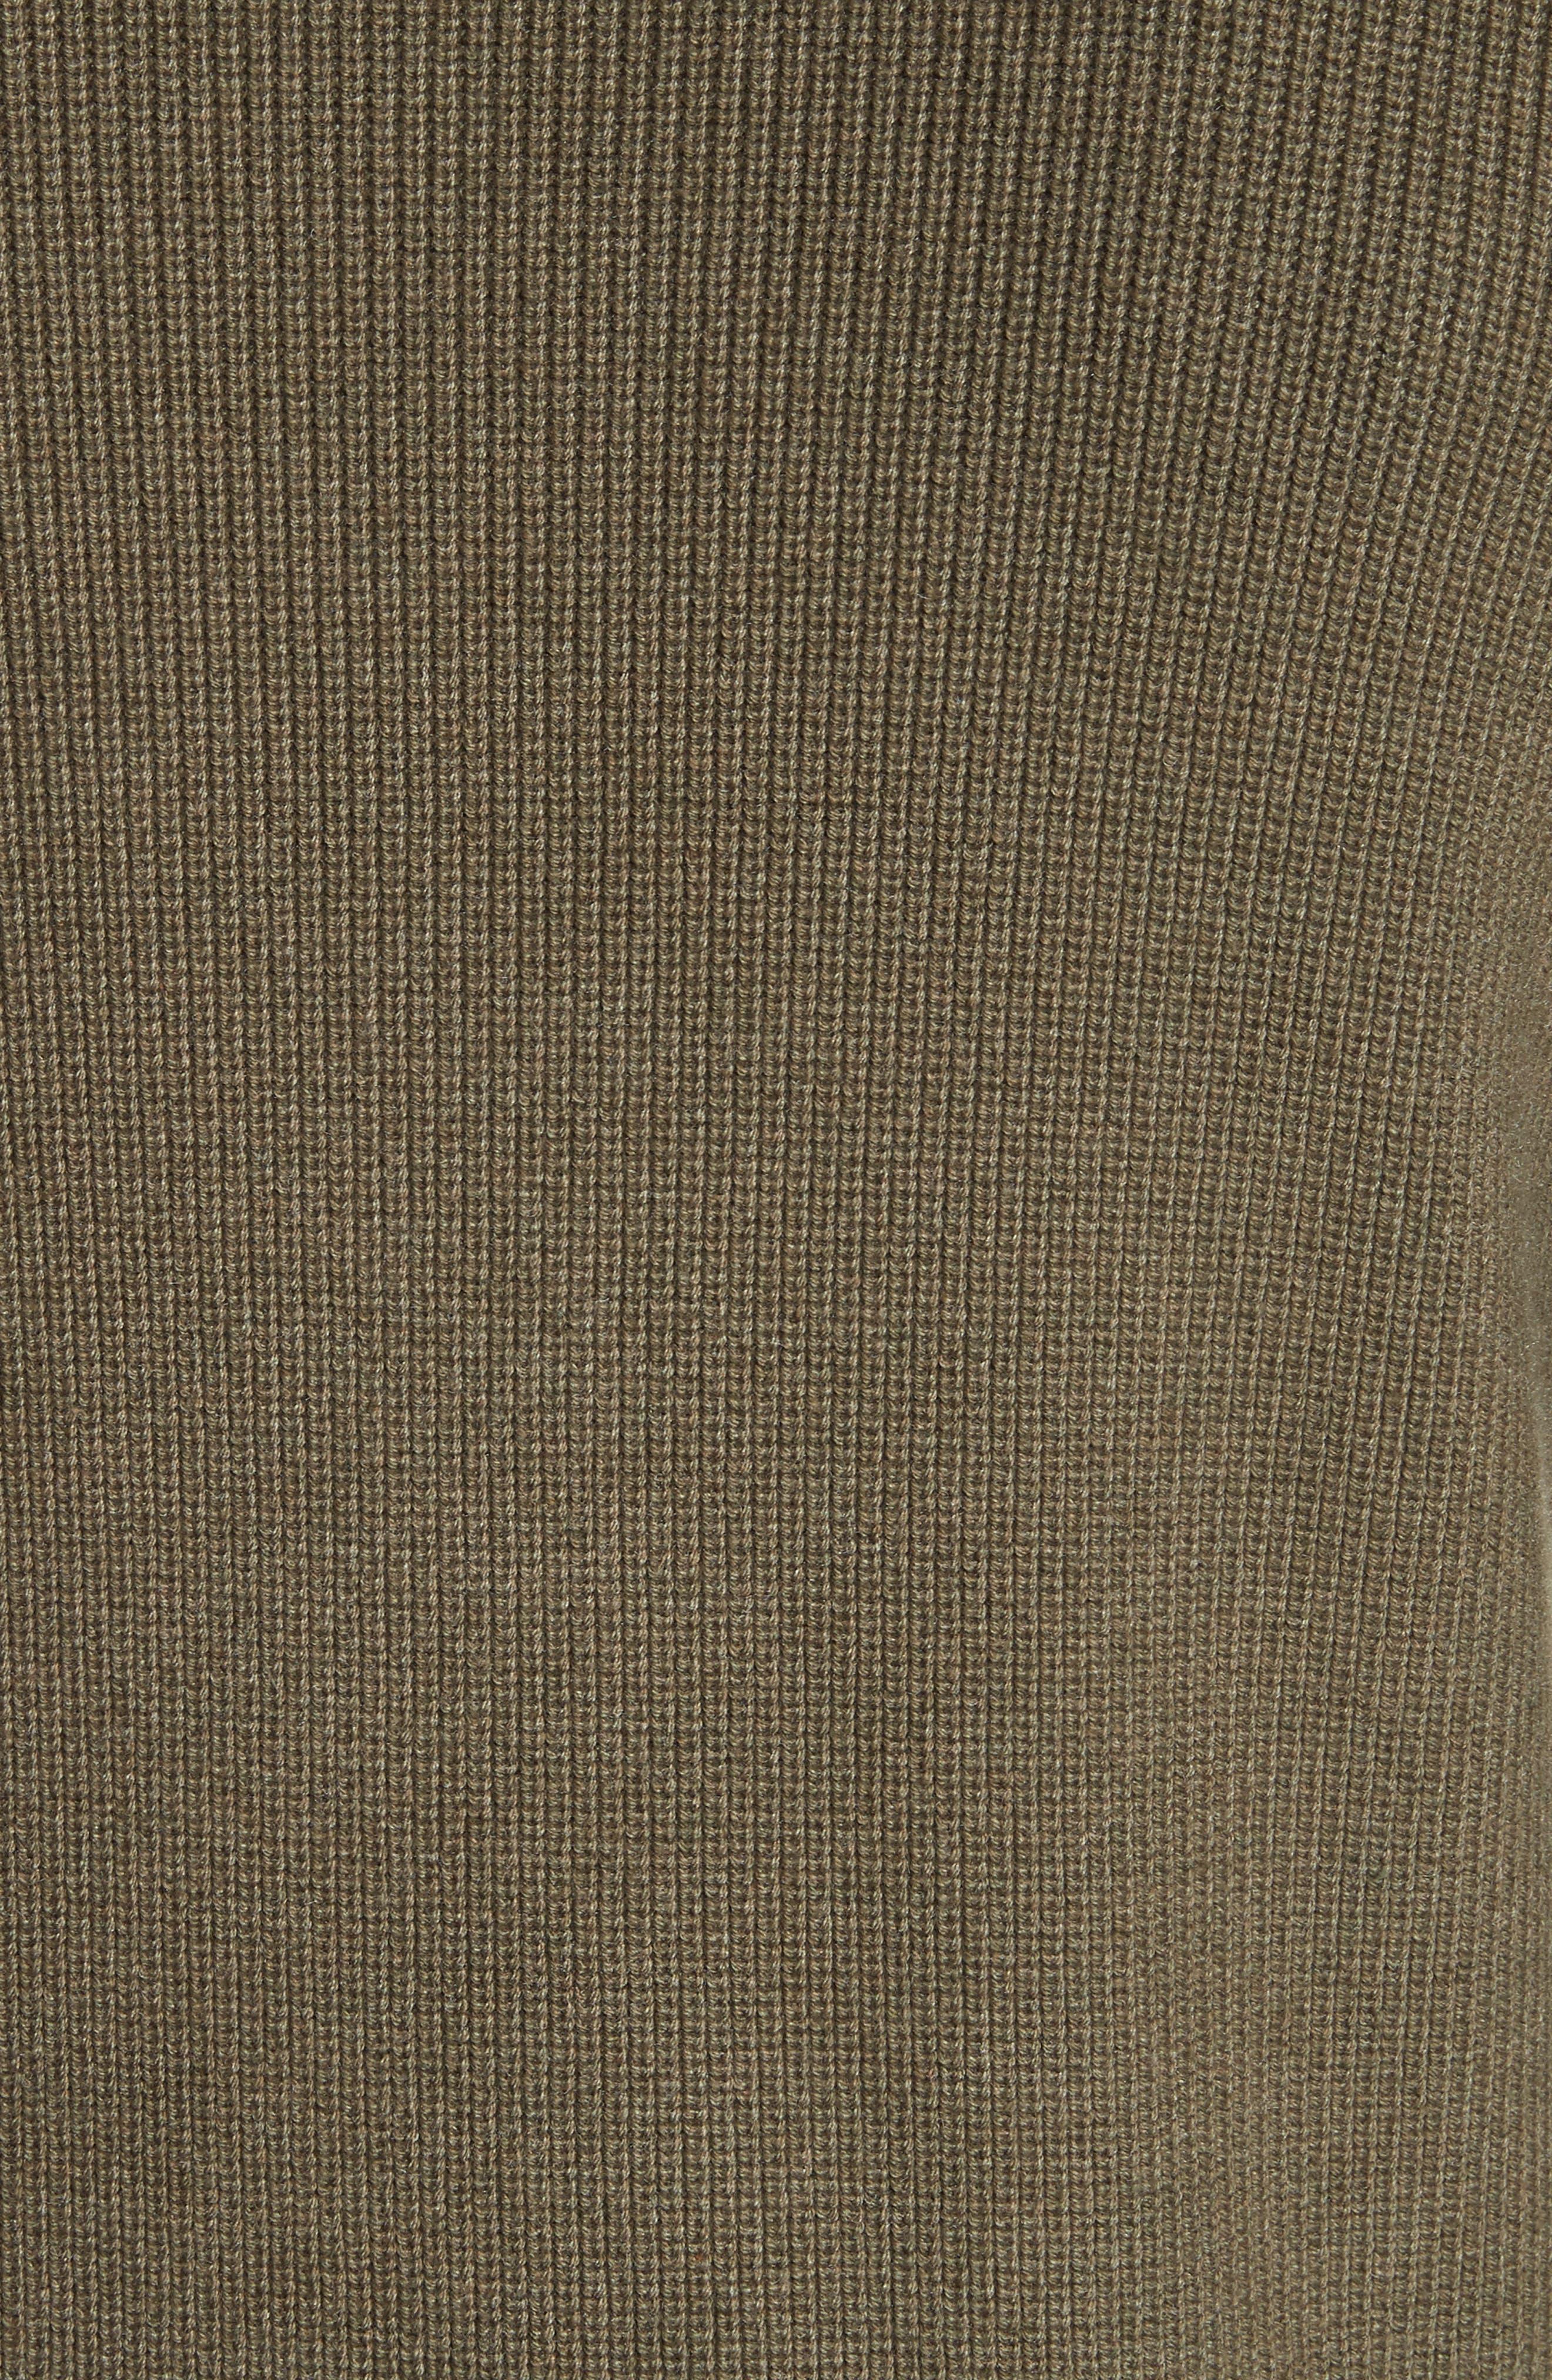 Crewneck Cotton Blend Sweater,                             Alternate thumbnail 5, color,                             Green